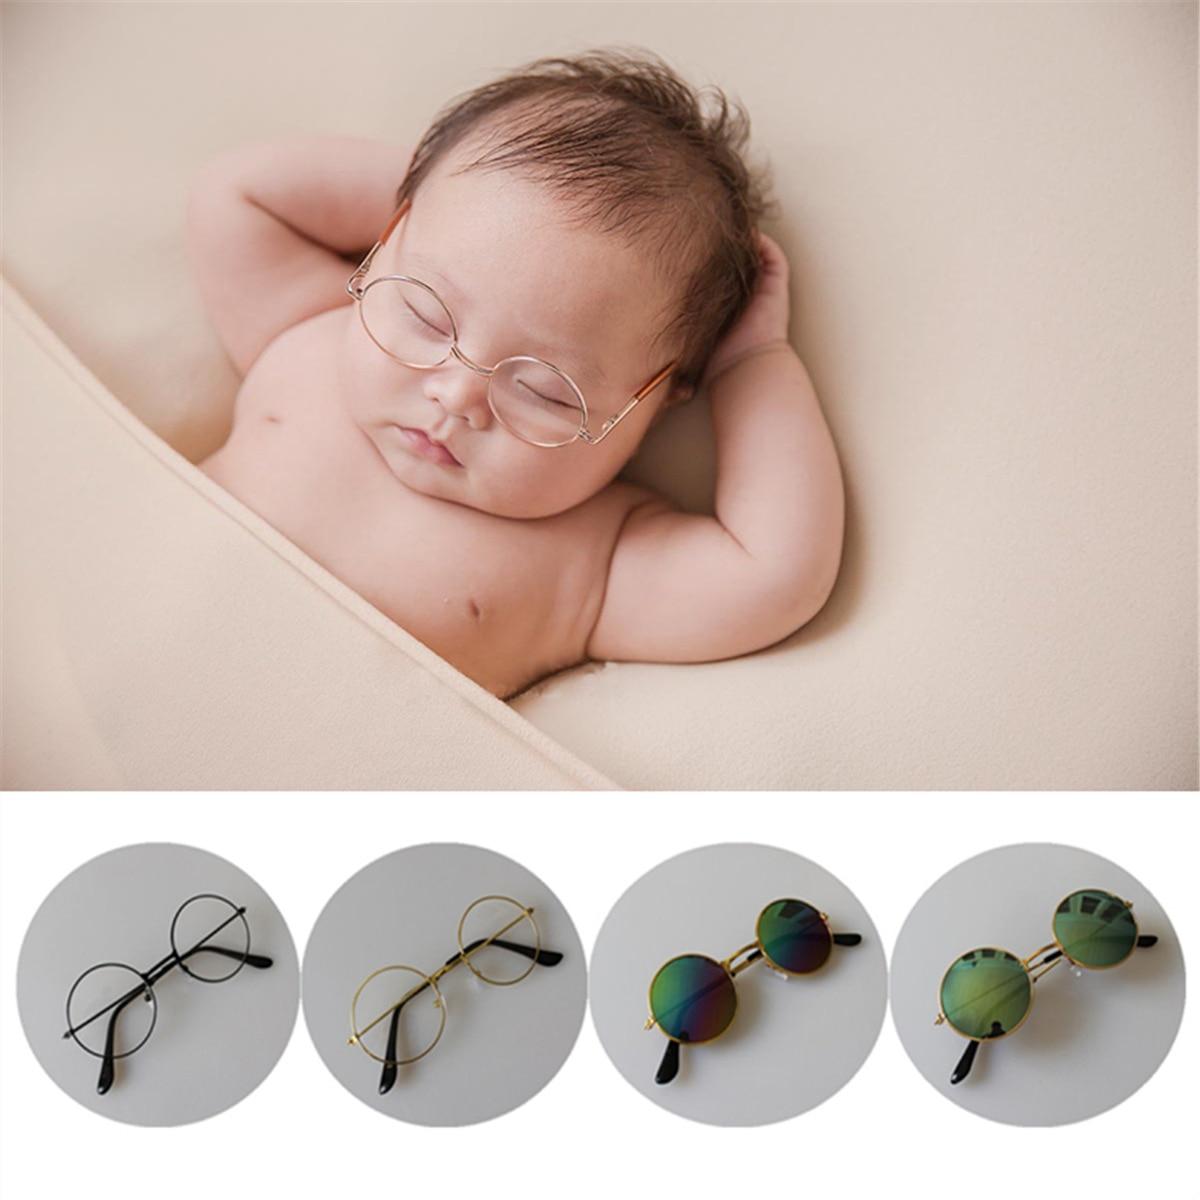 Blanket & Swaddling Baby Bedding Selfless 35*150cm Stretch Knit Wrap Newborn Photography Props Baby Kids Nubble Rayon Wraps Maternity Scarf Hammock Swaddlings